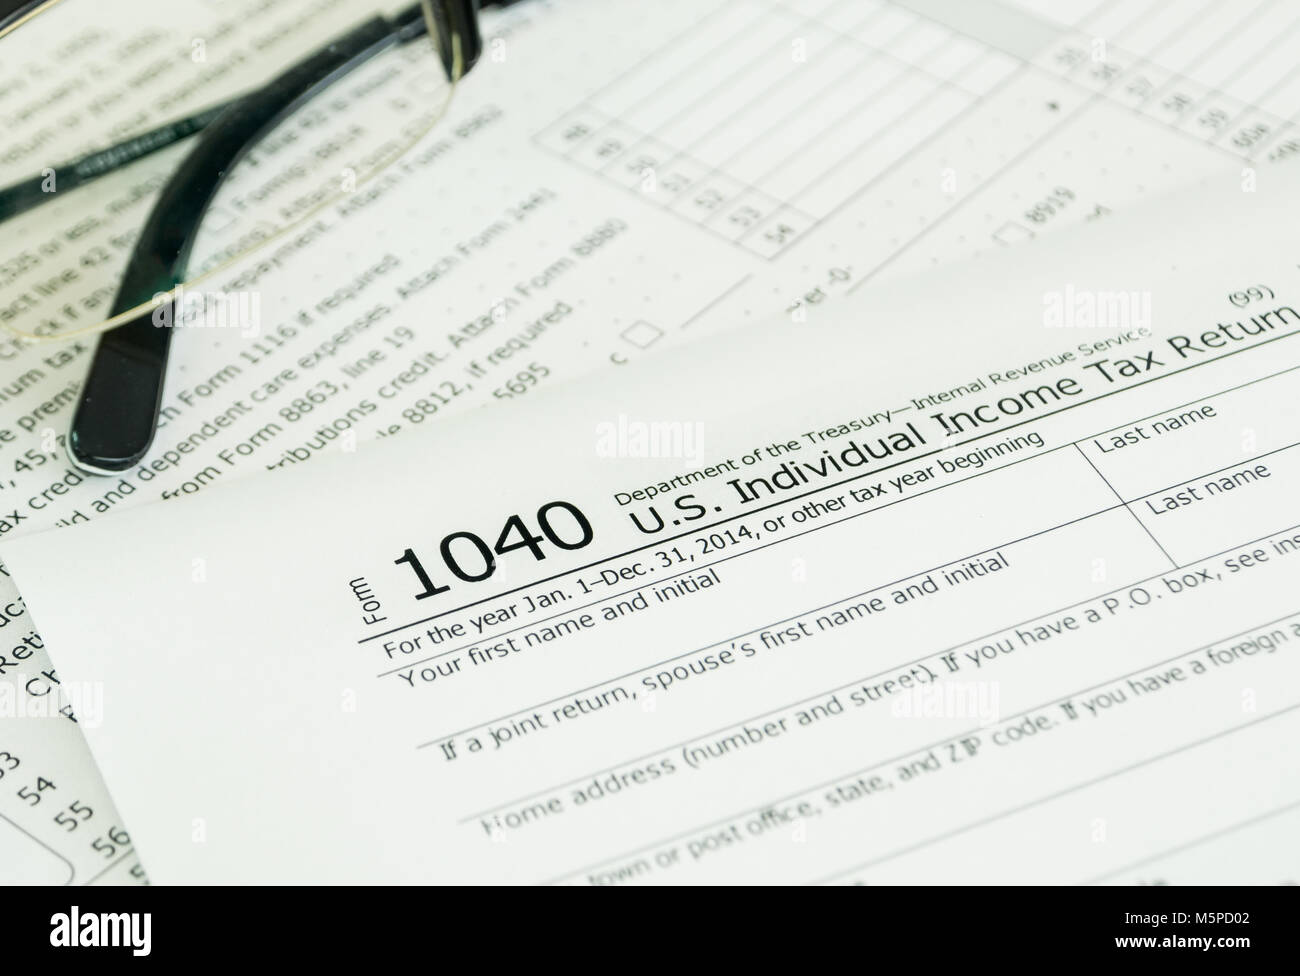 Individual Income Tax Return Form On Desk Stock Photo 175670098 Alamy